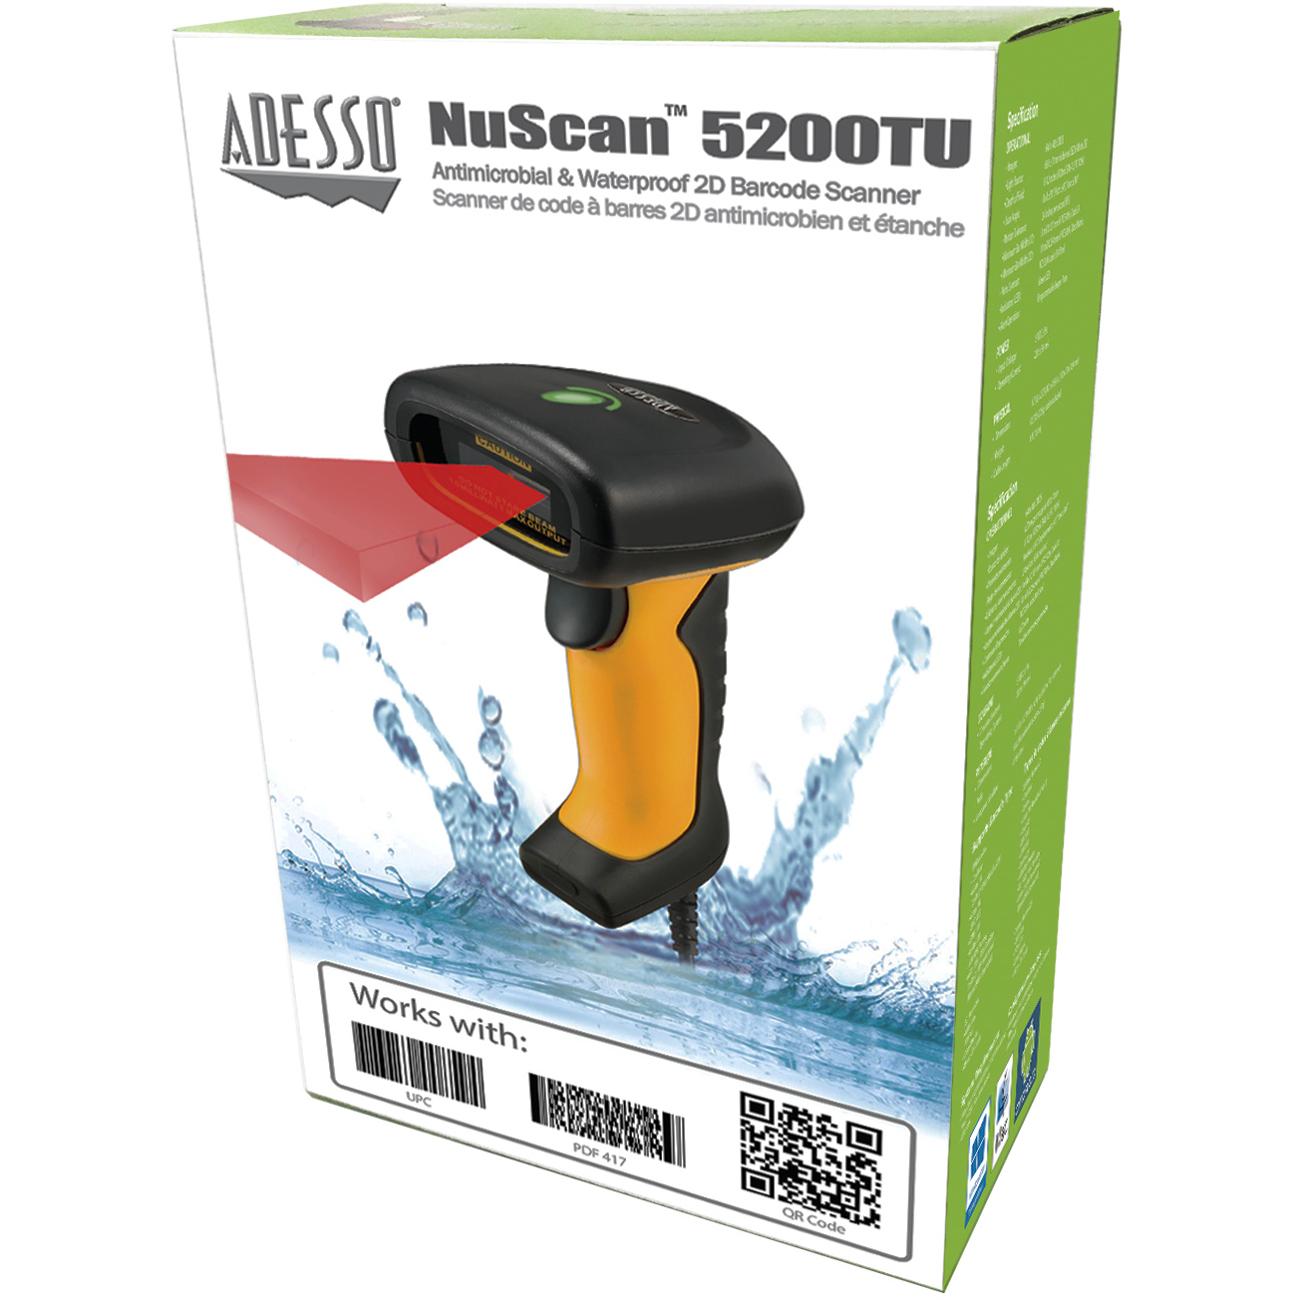 Adesso NuScan 5200TU  Antimicrobial & Waterproof 2D Barcode Scanner Alternate-Image3